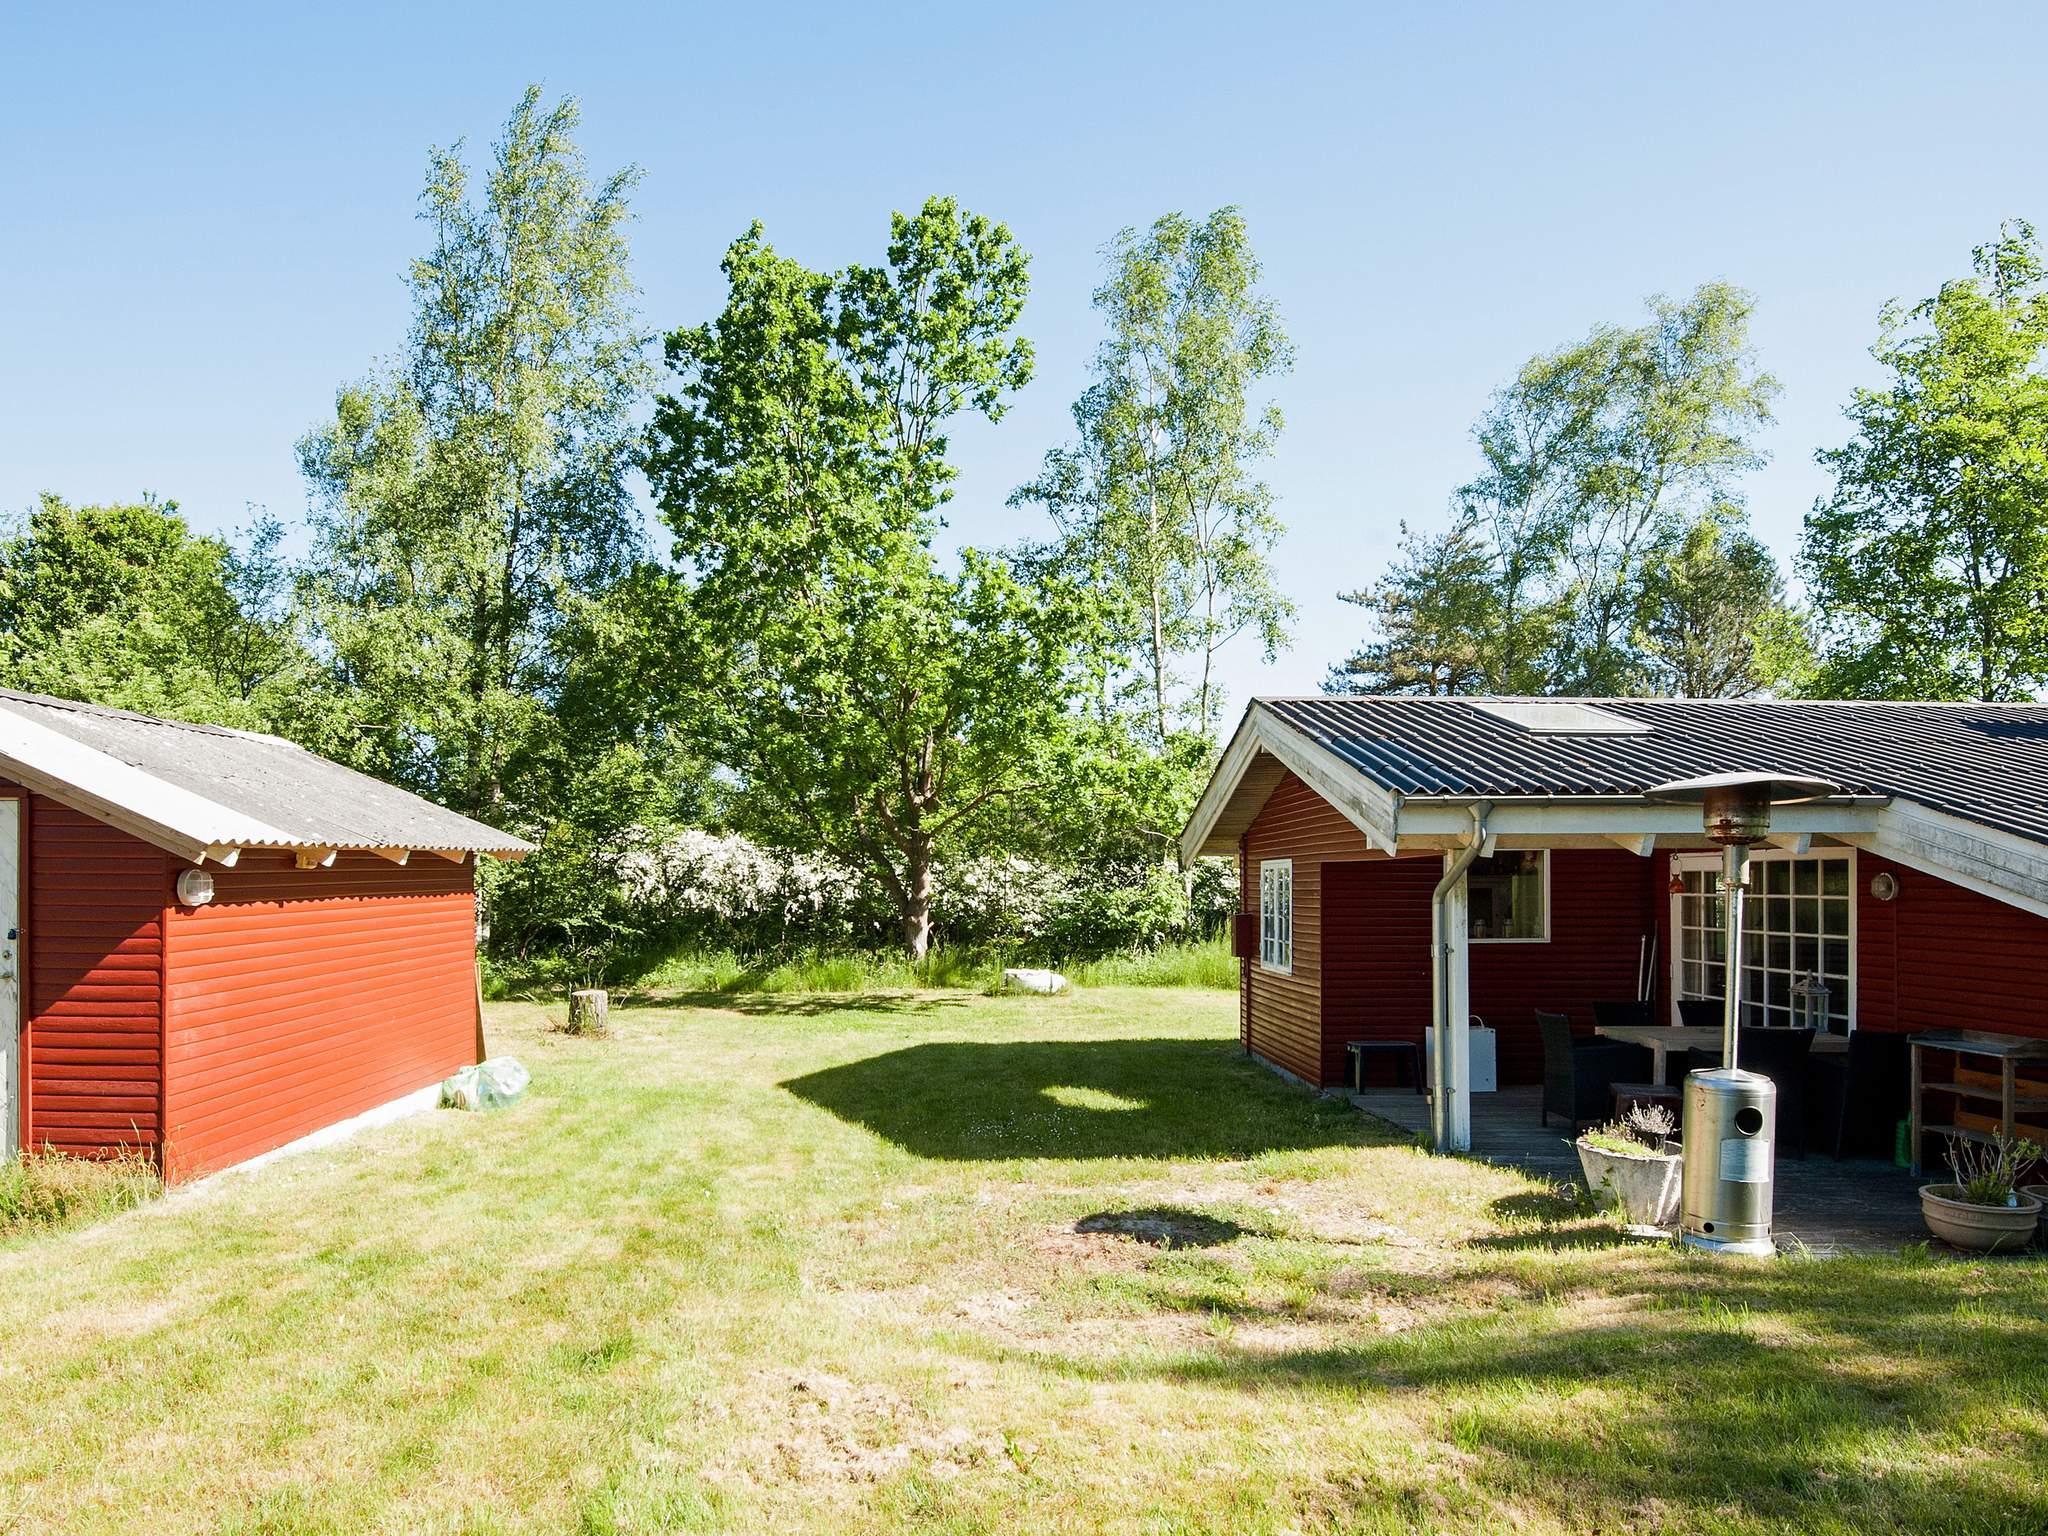 Maison de vacances Helgenæs (2354348), Knebel, , Mer Baltique danoise, Danemark, image 14